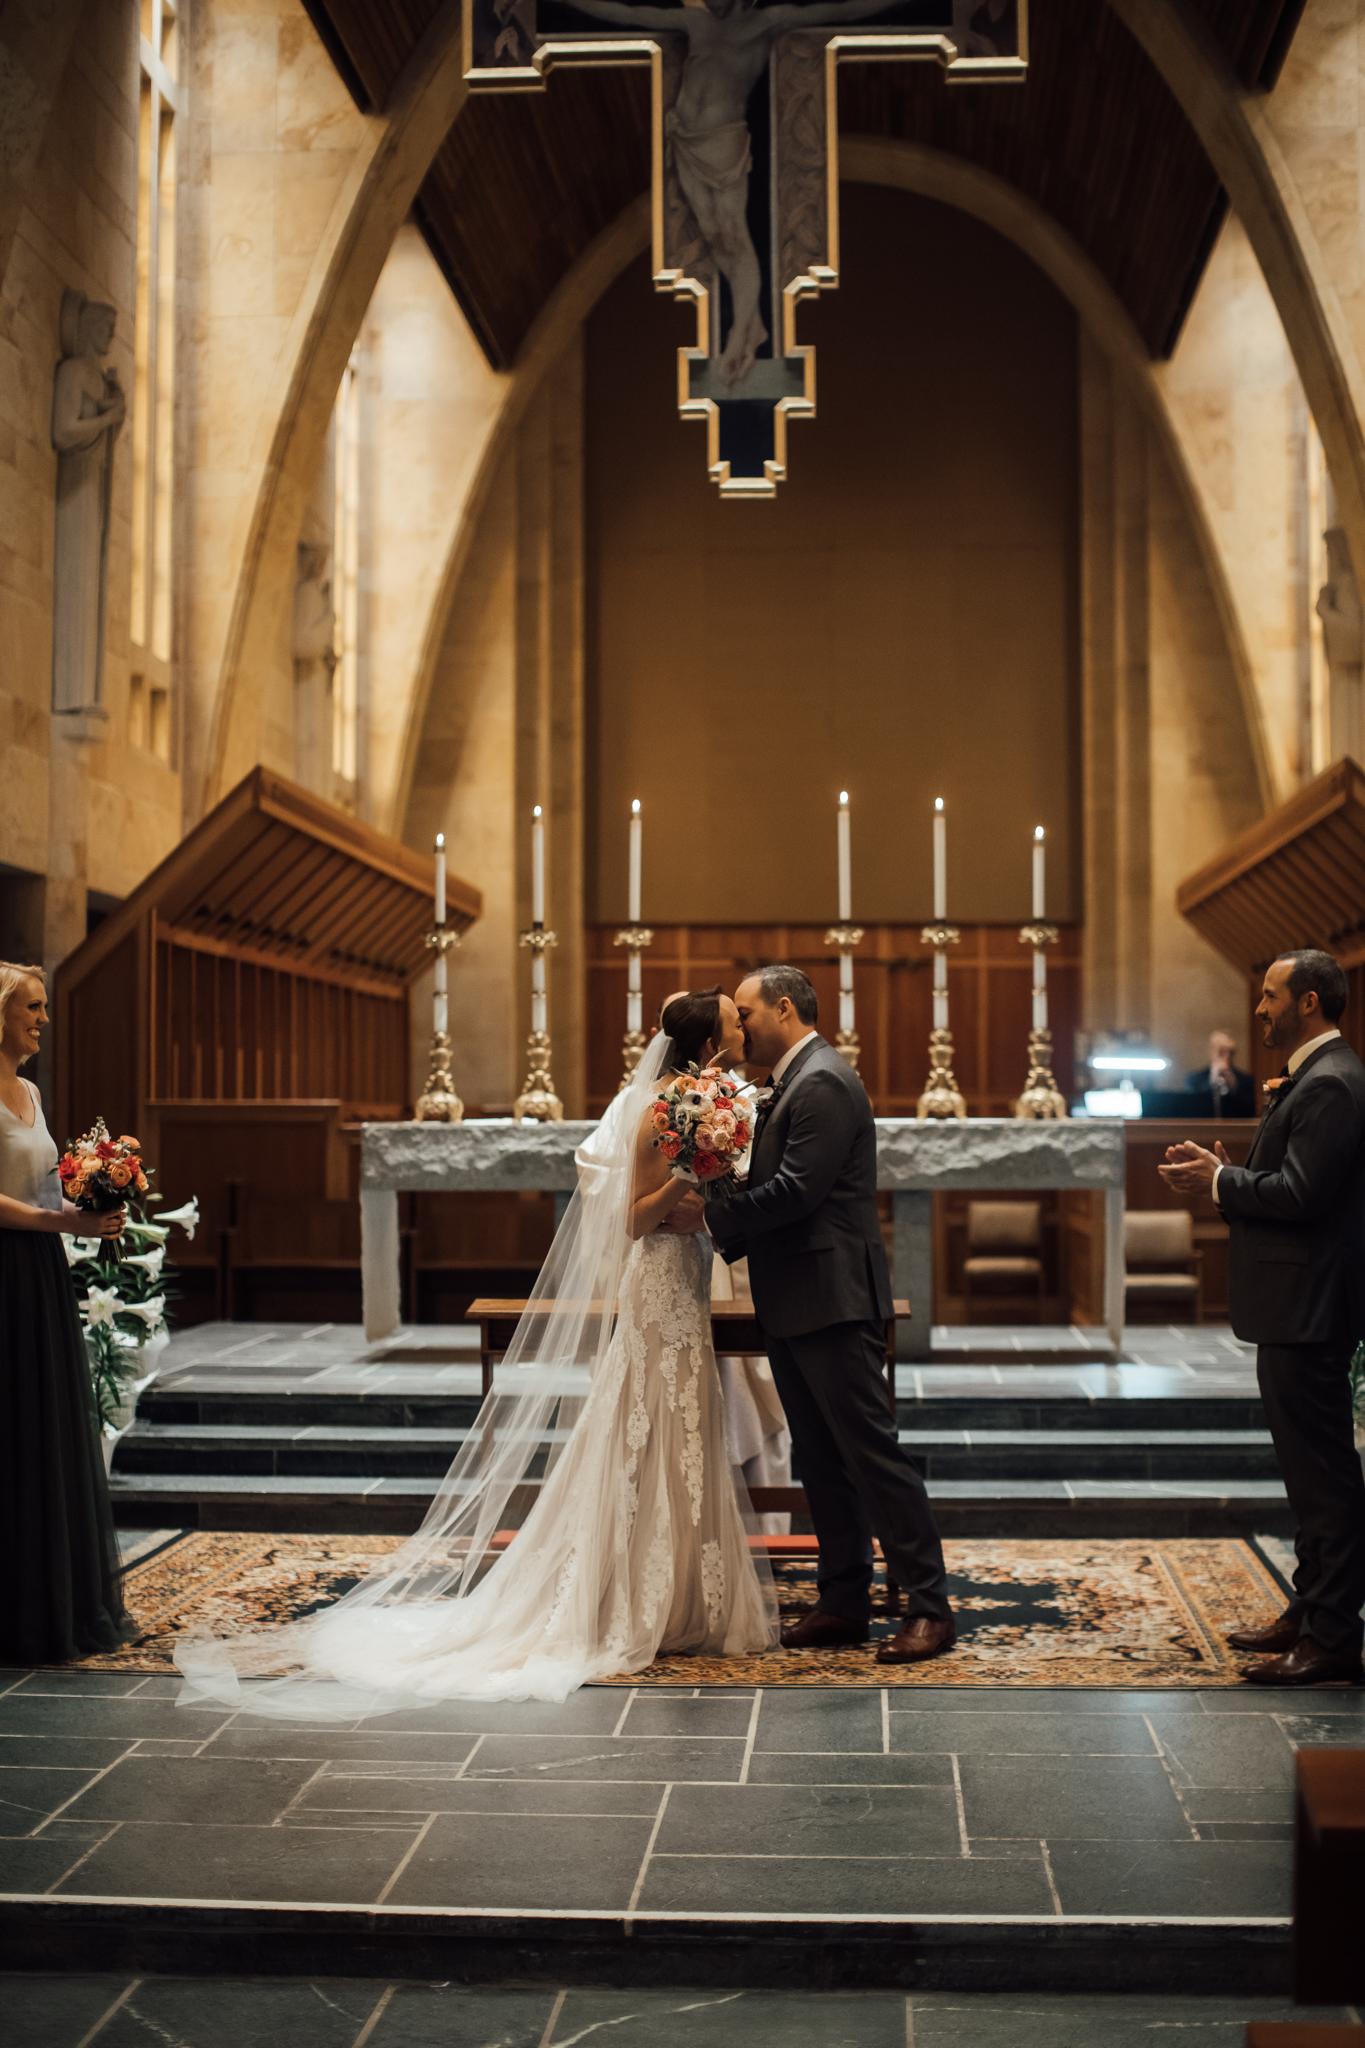 birmingham-alabama-wedding-photographer-laura-terry-the-warmth-around-you (77 of 110).jpg